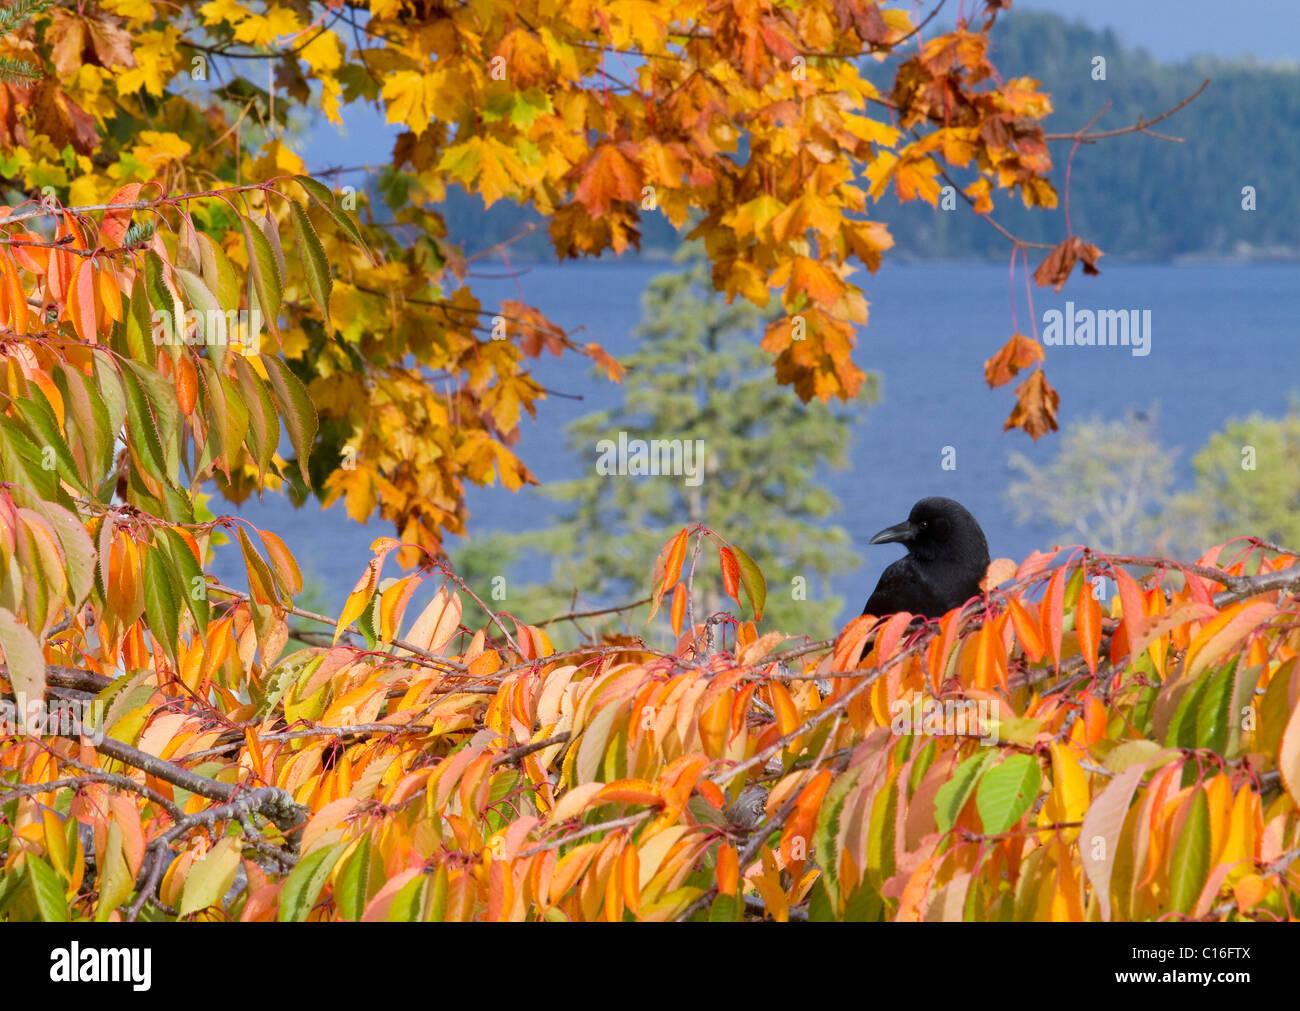 Krähe saß auf Ast mit goldenen Blättern mit Blick auf Hardy Bay Vancouver Island Stockbild